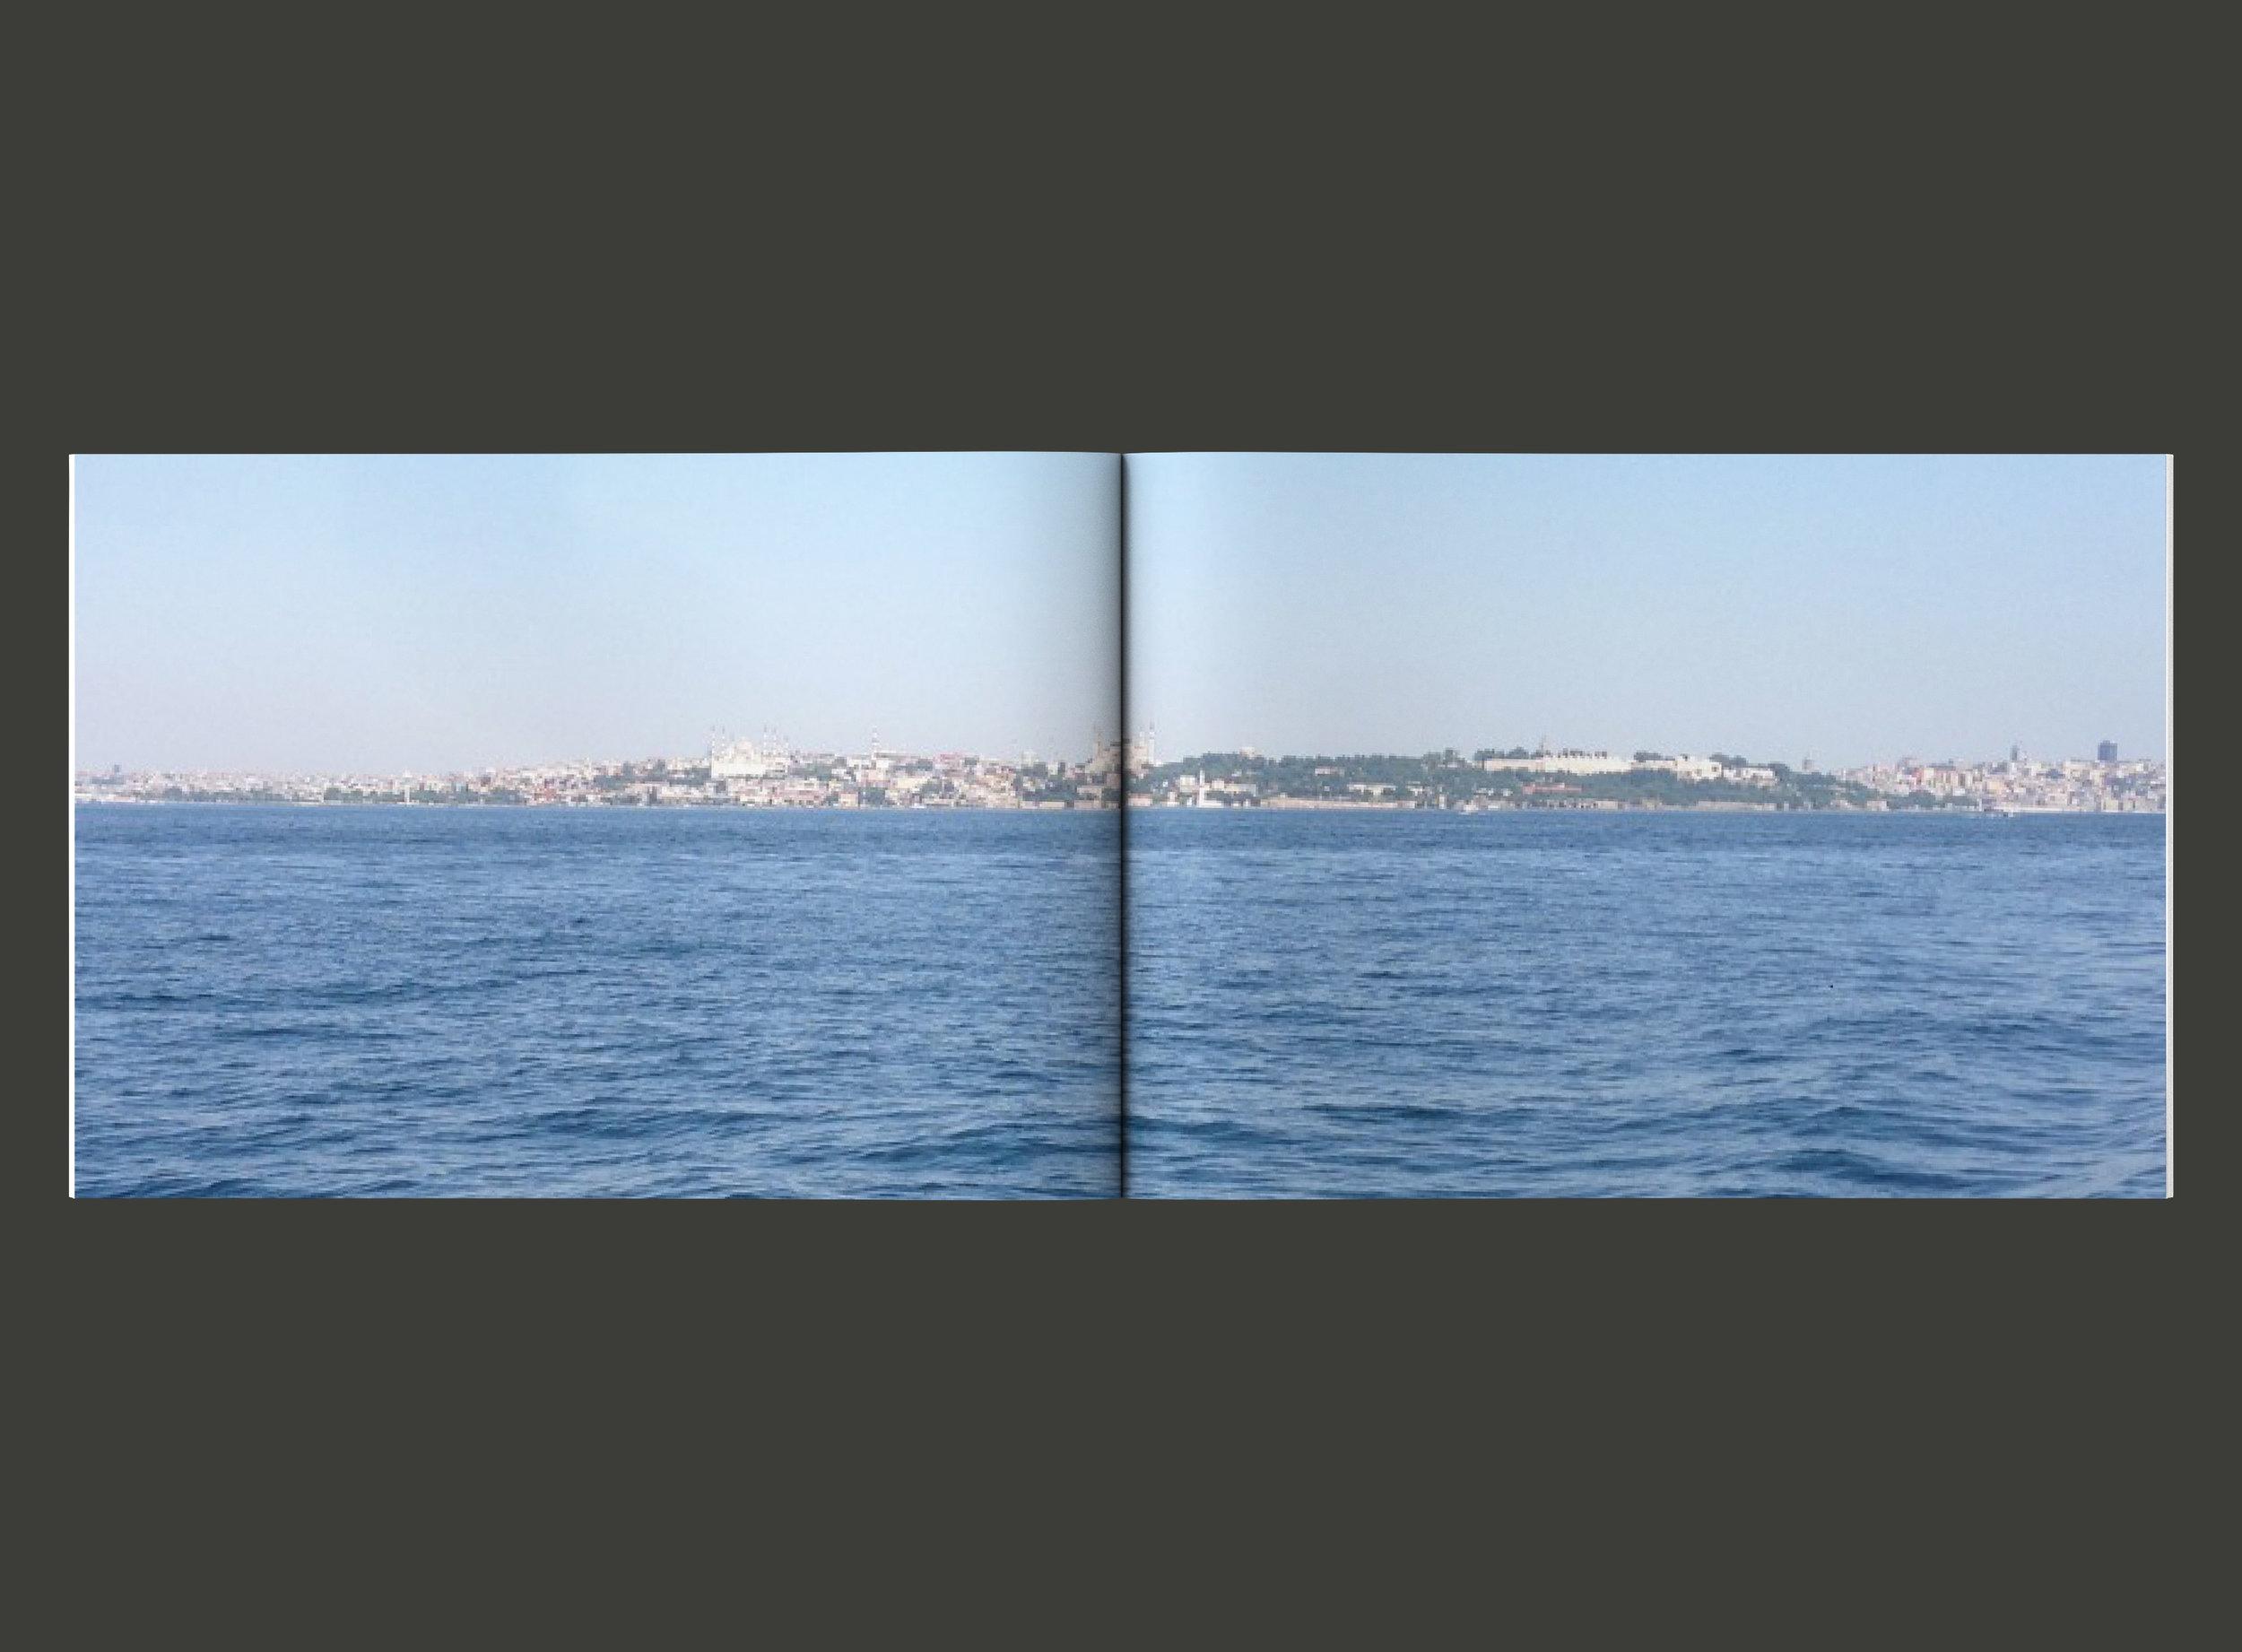 FONN ocean photo.jpg